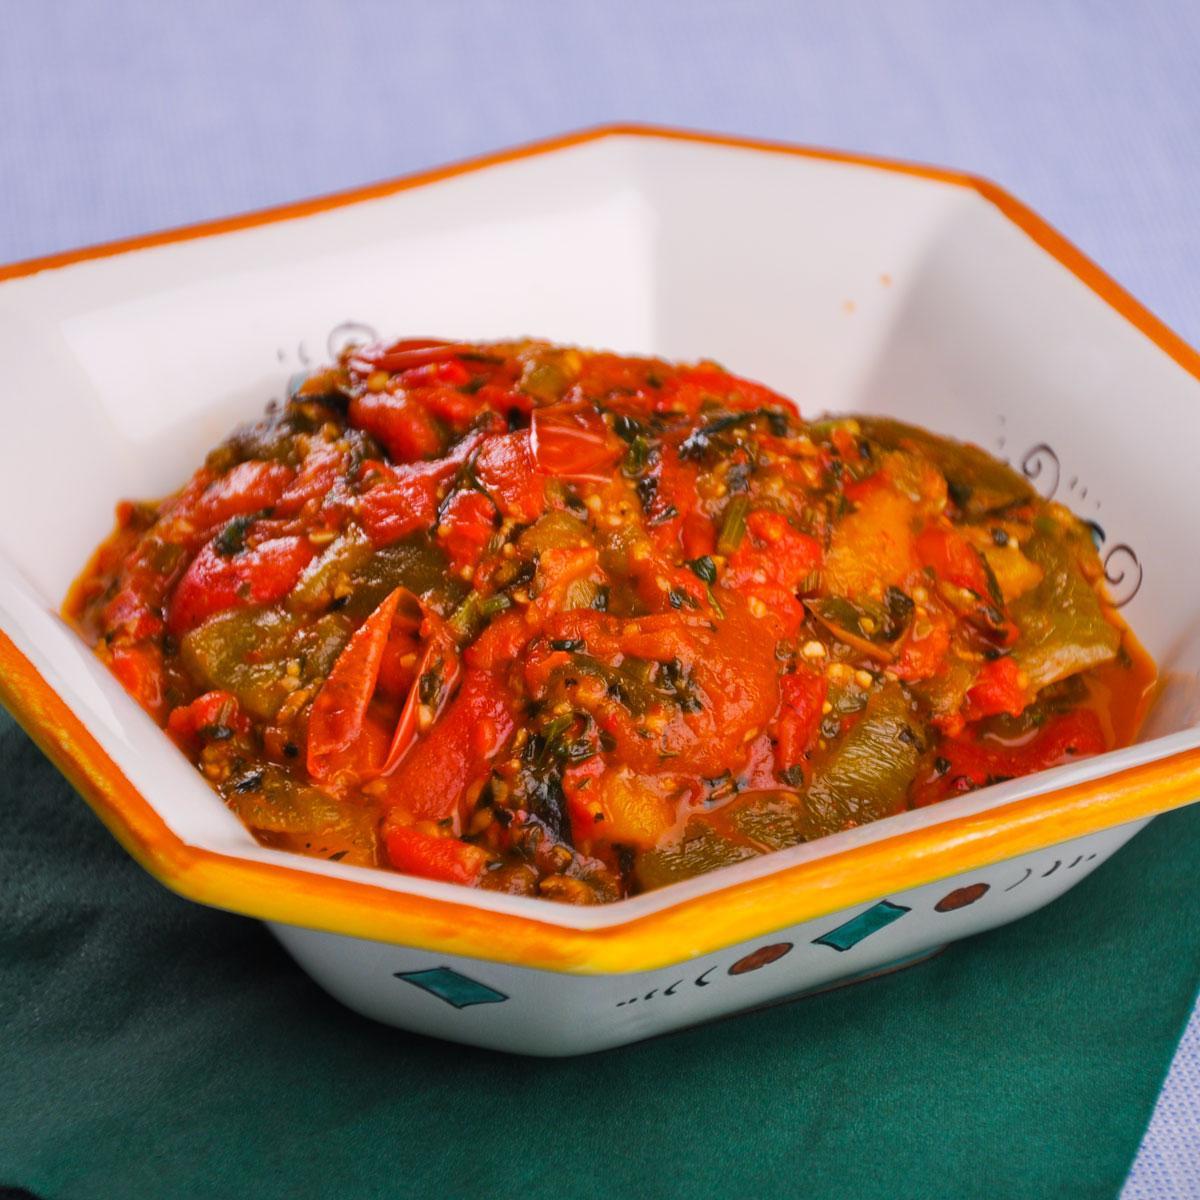 recette salade marocaine aux poivrons cuisine madame figaro. Black Bedroom Furniture Sets. Home Design Ideas